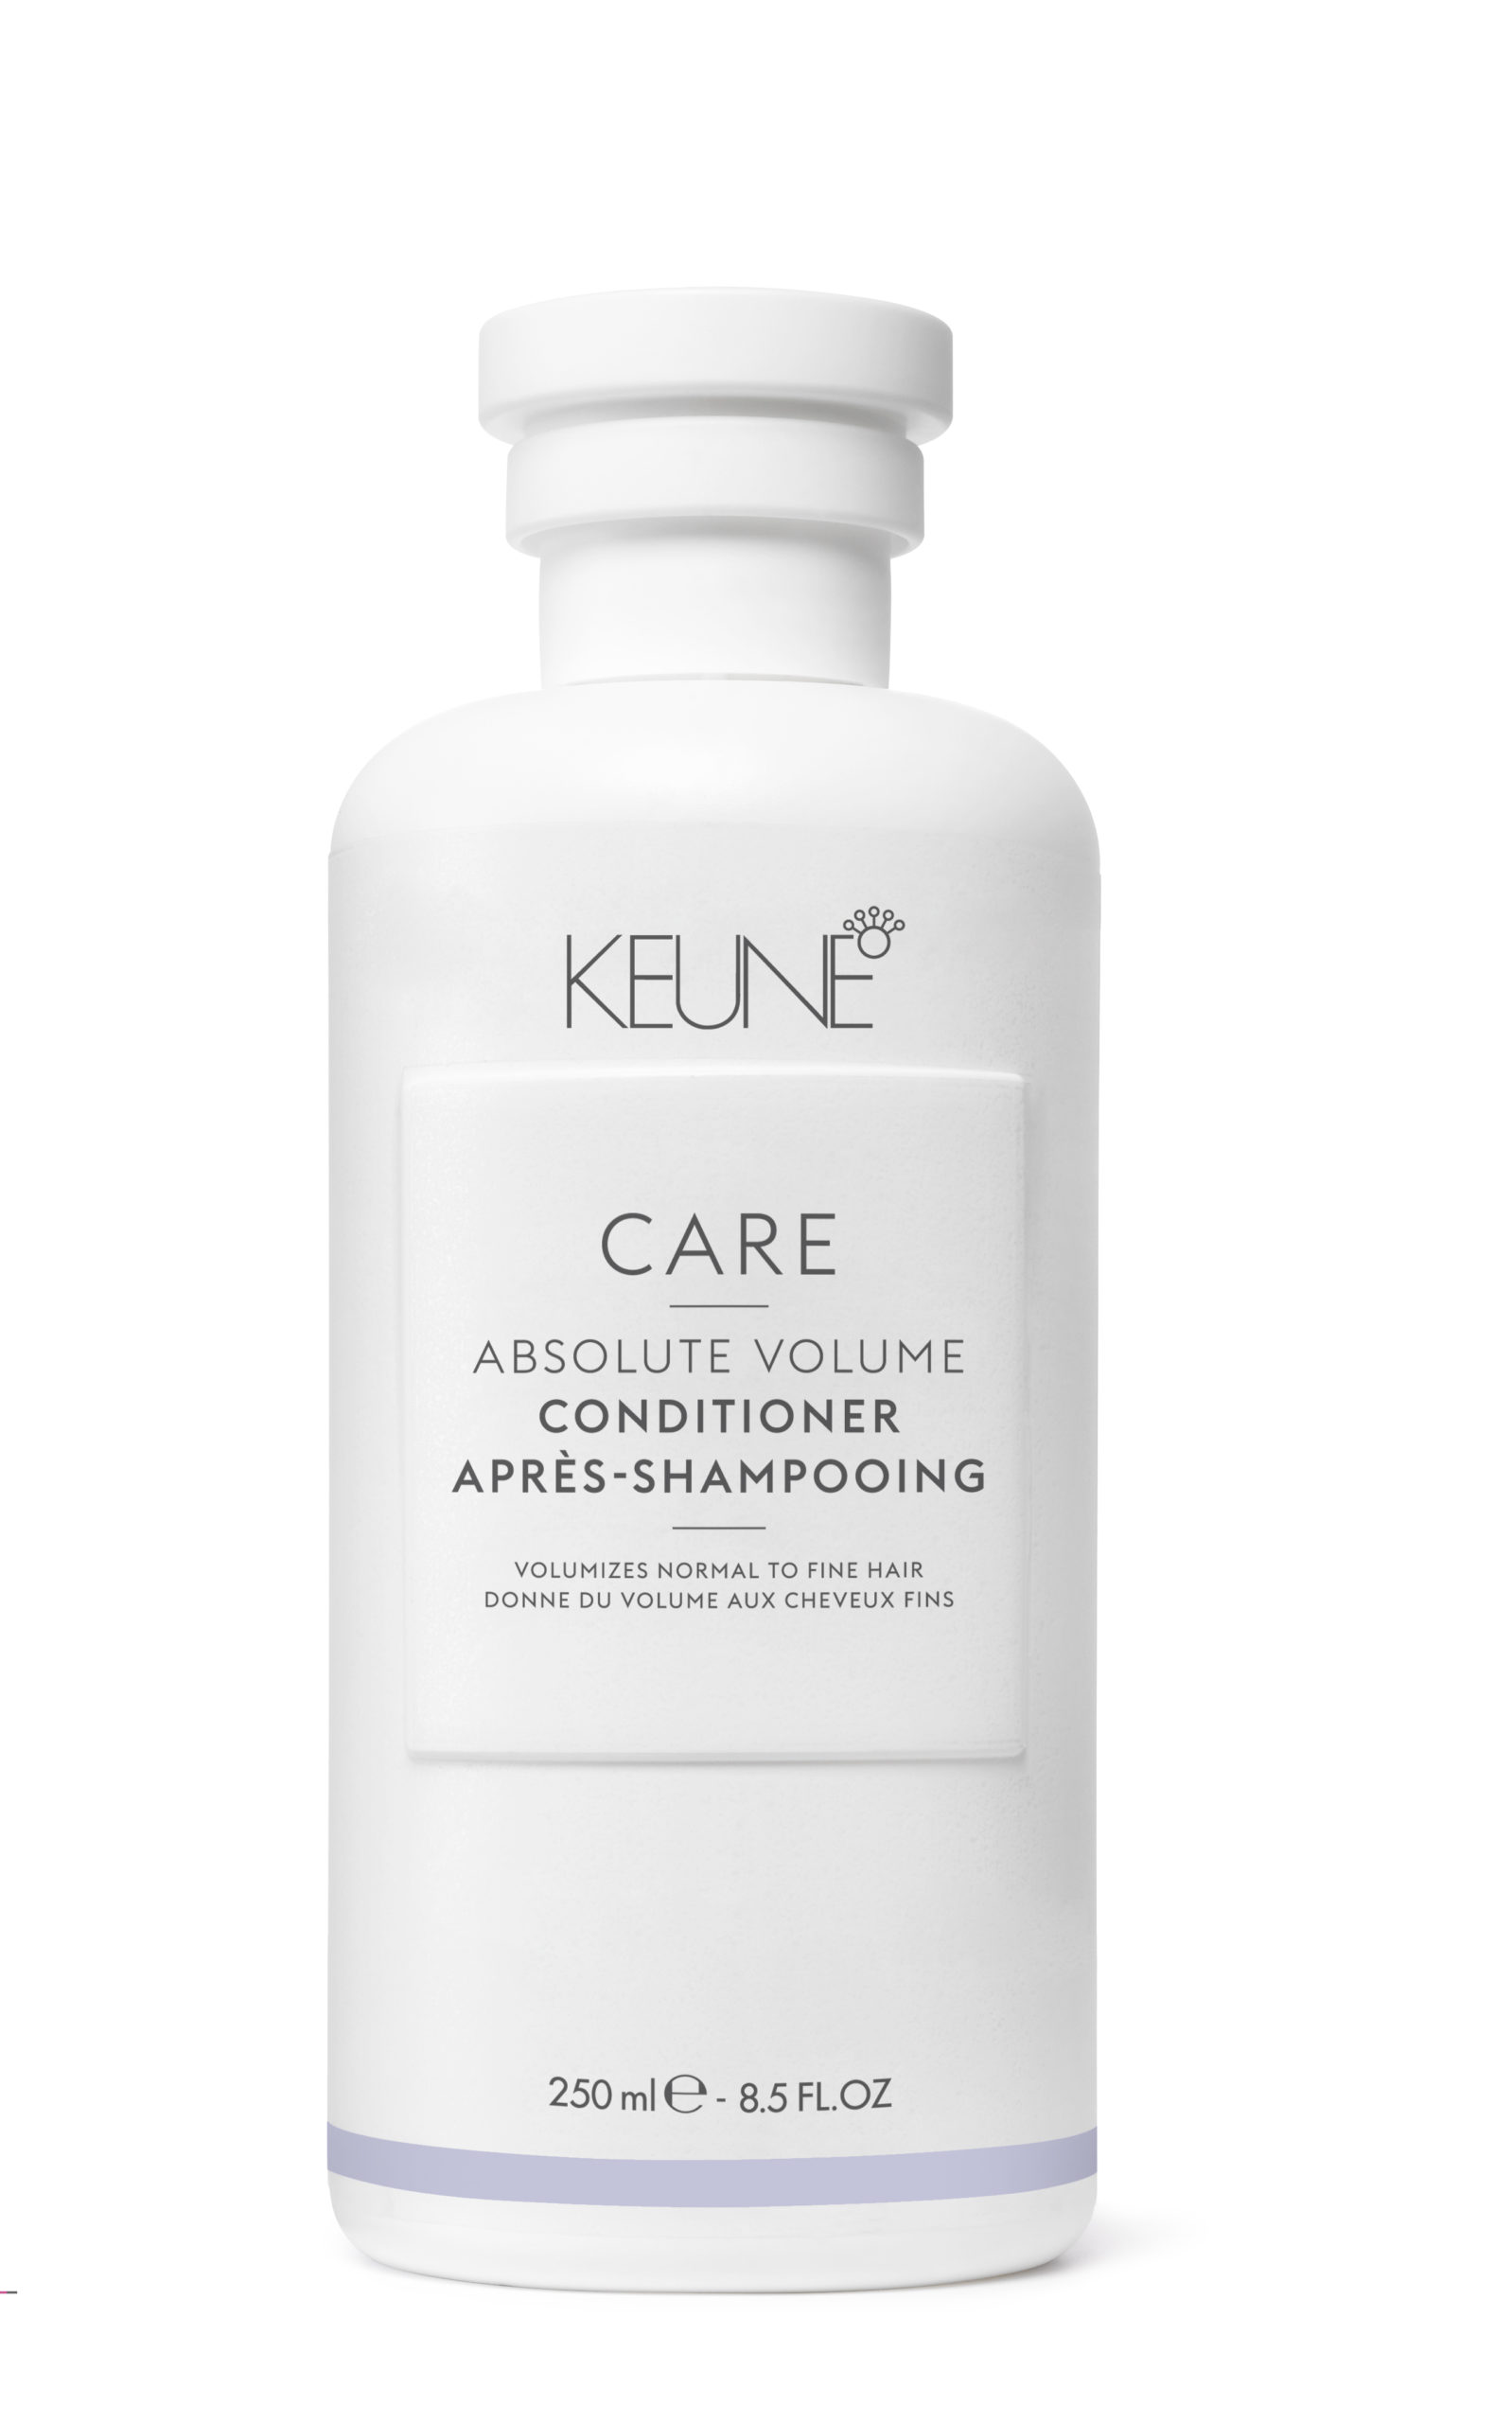 Care-Absolute-Volume-Conditioner-250ml-def-highres